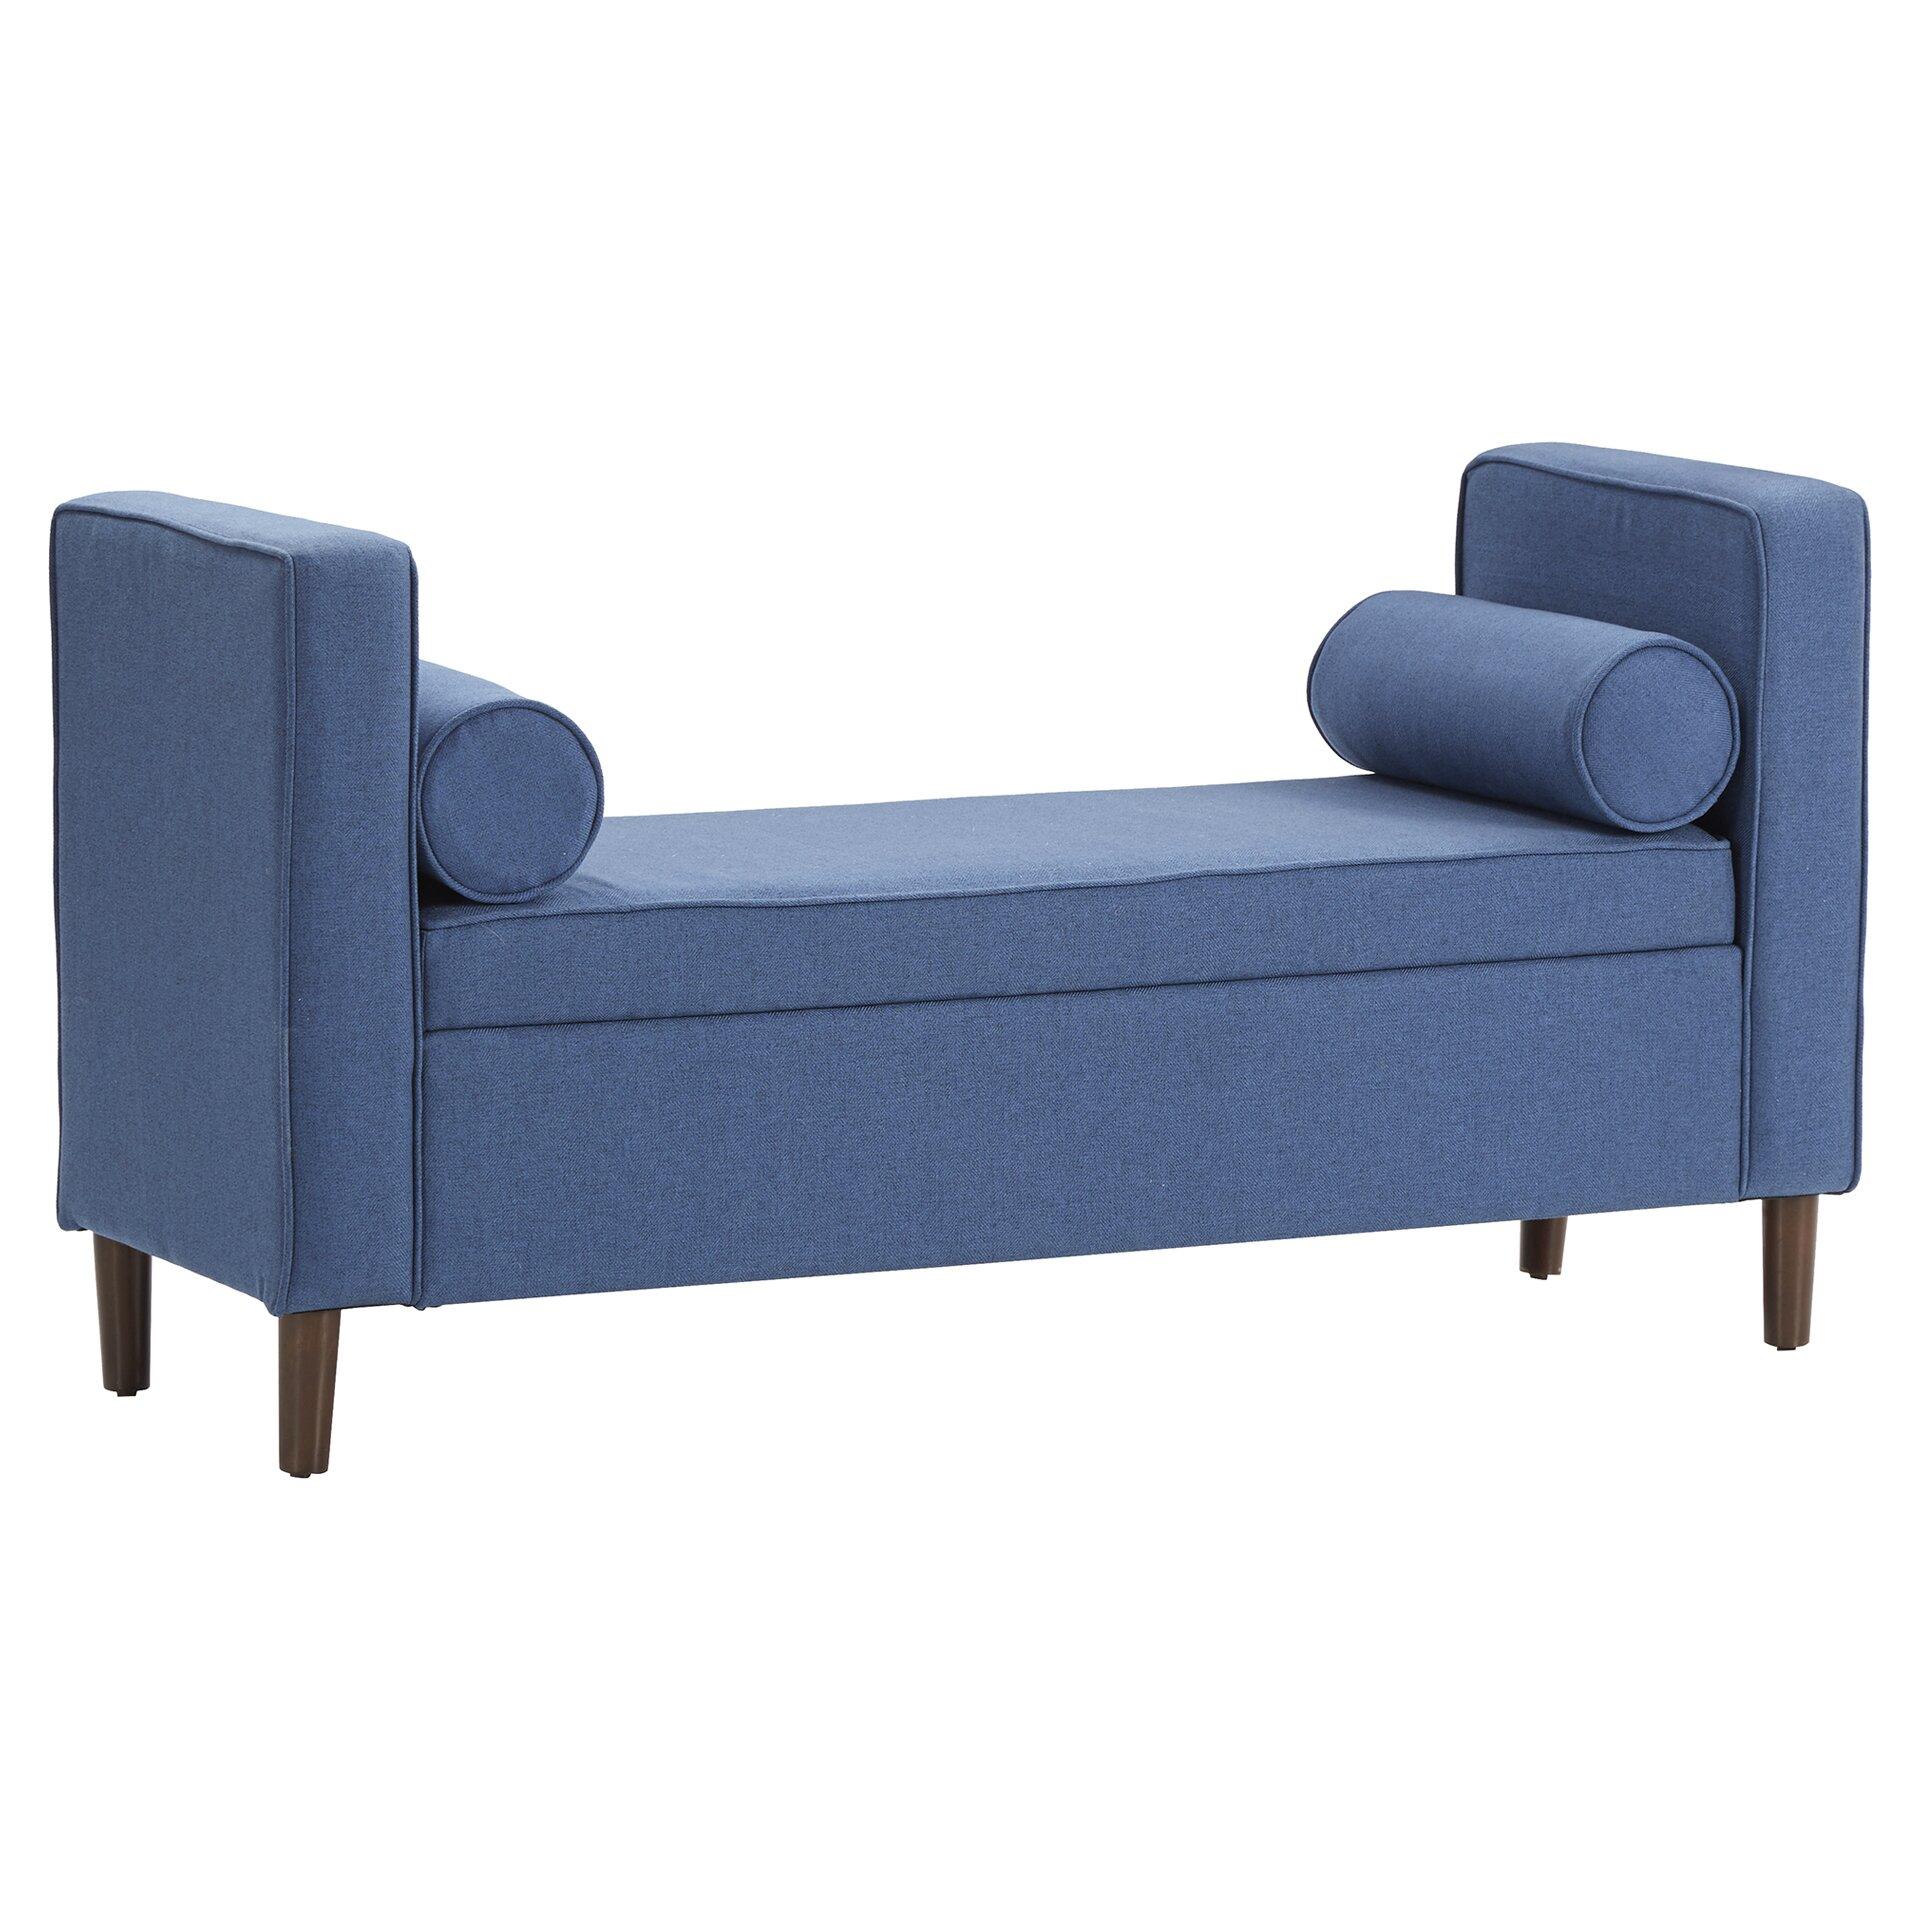 Mercury Row Rimo Upholstered Storage Bench Reviews Wayfair